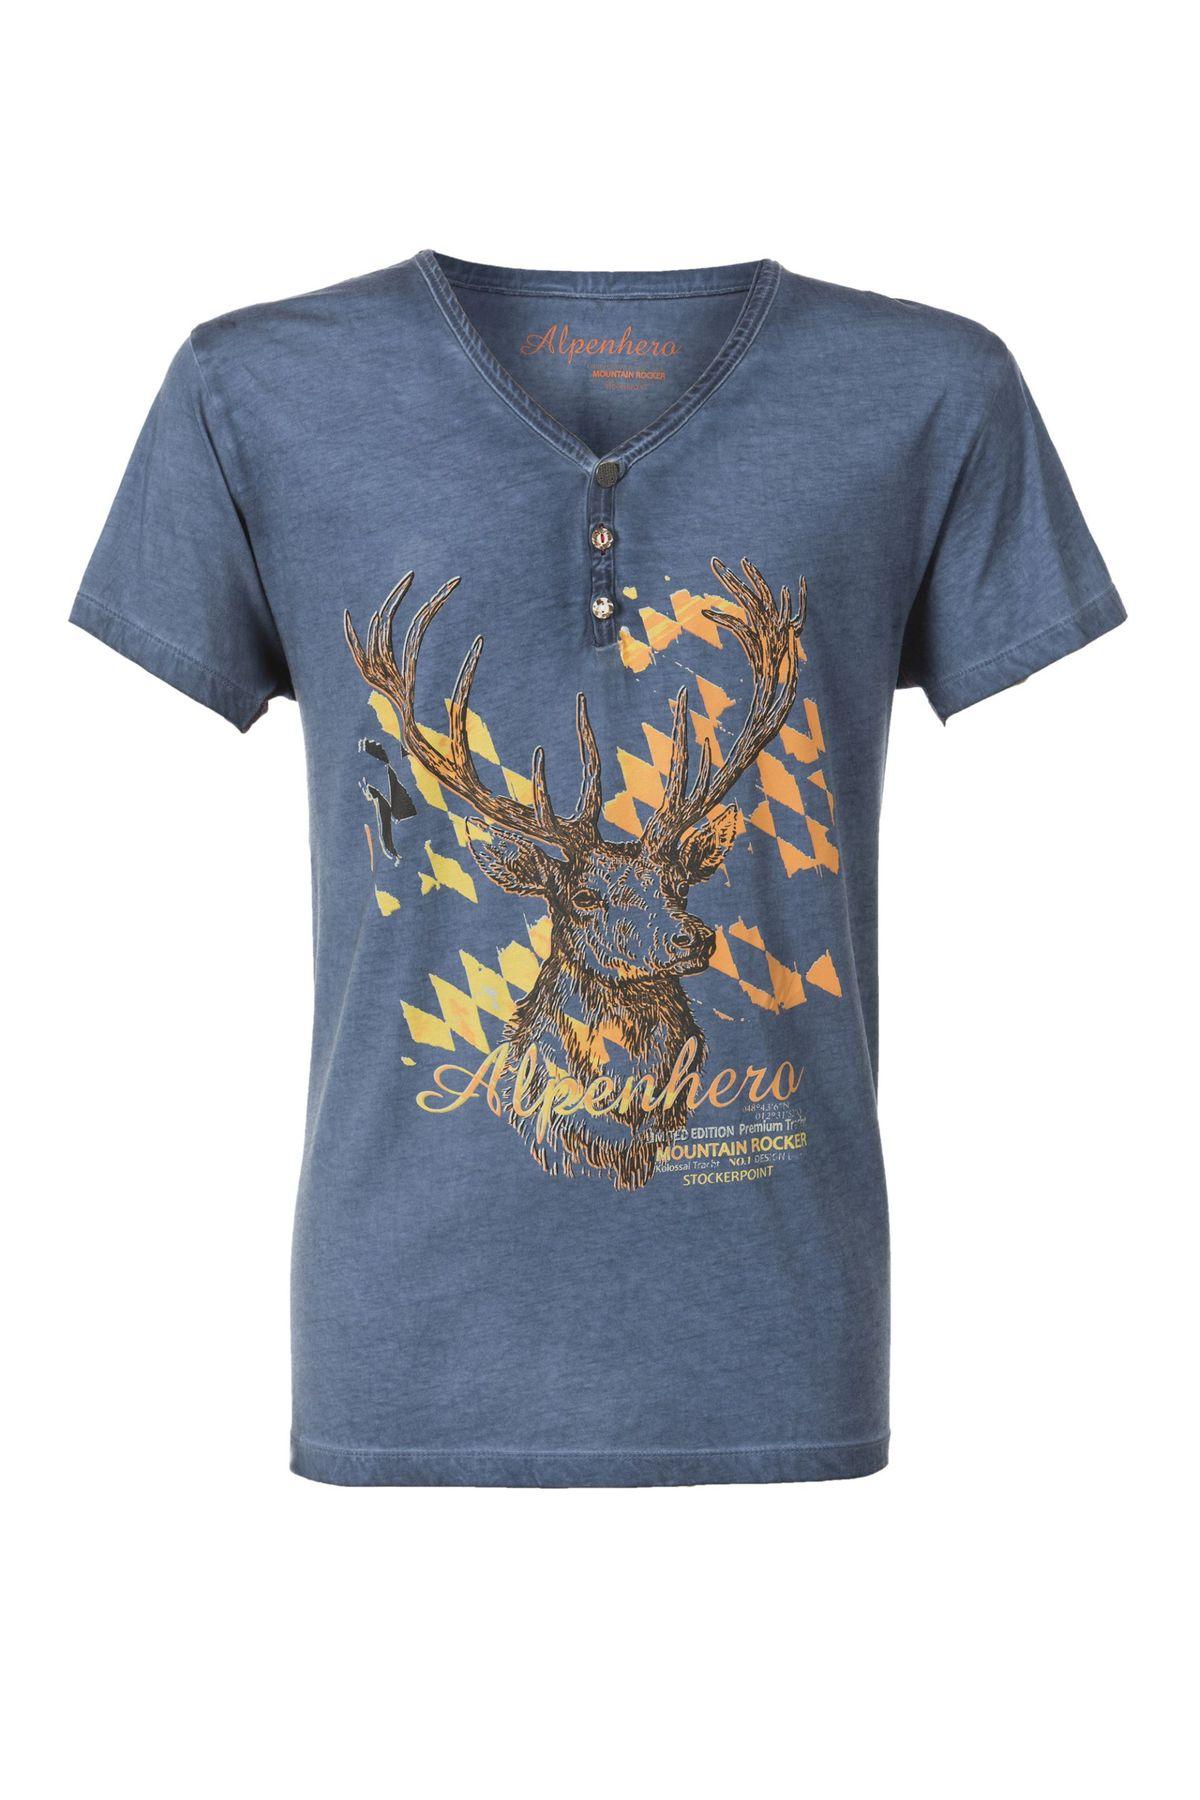 Stockerpoint - Herren Trachten T-Shirt, Feli – Bild 5